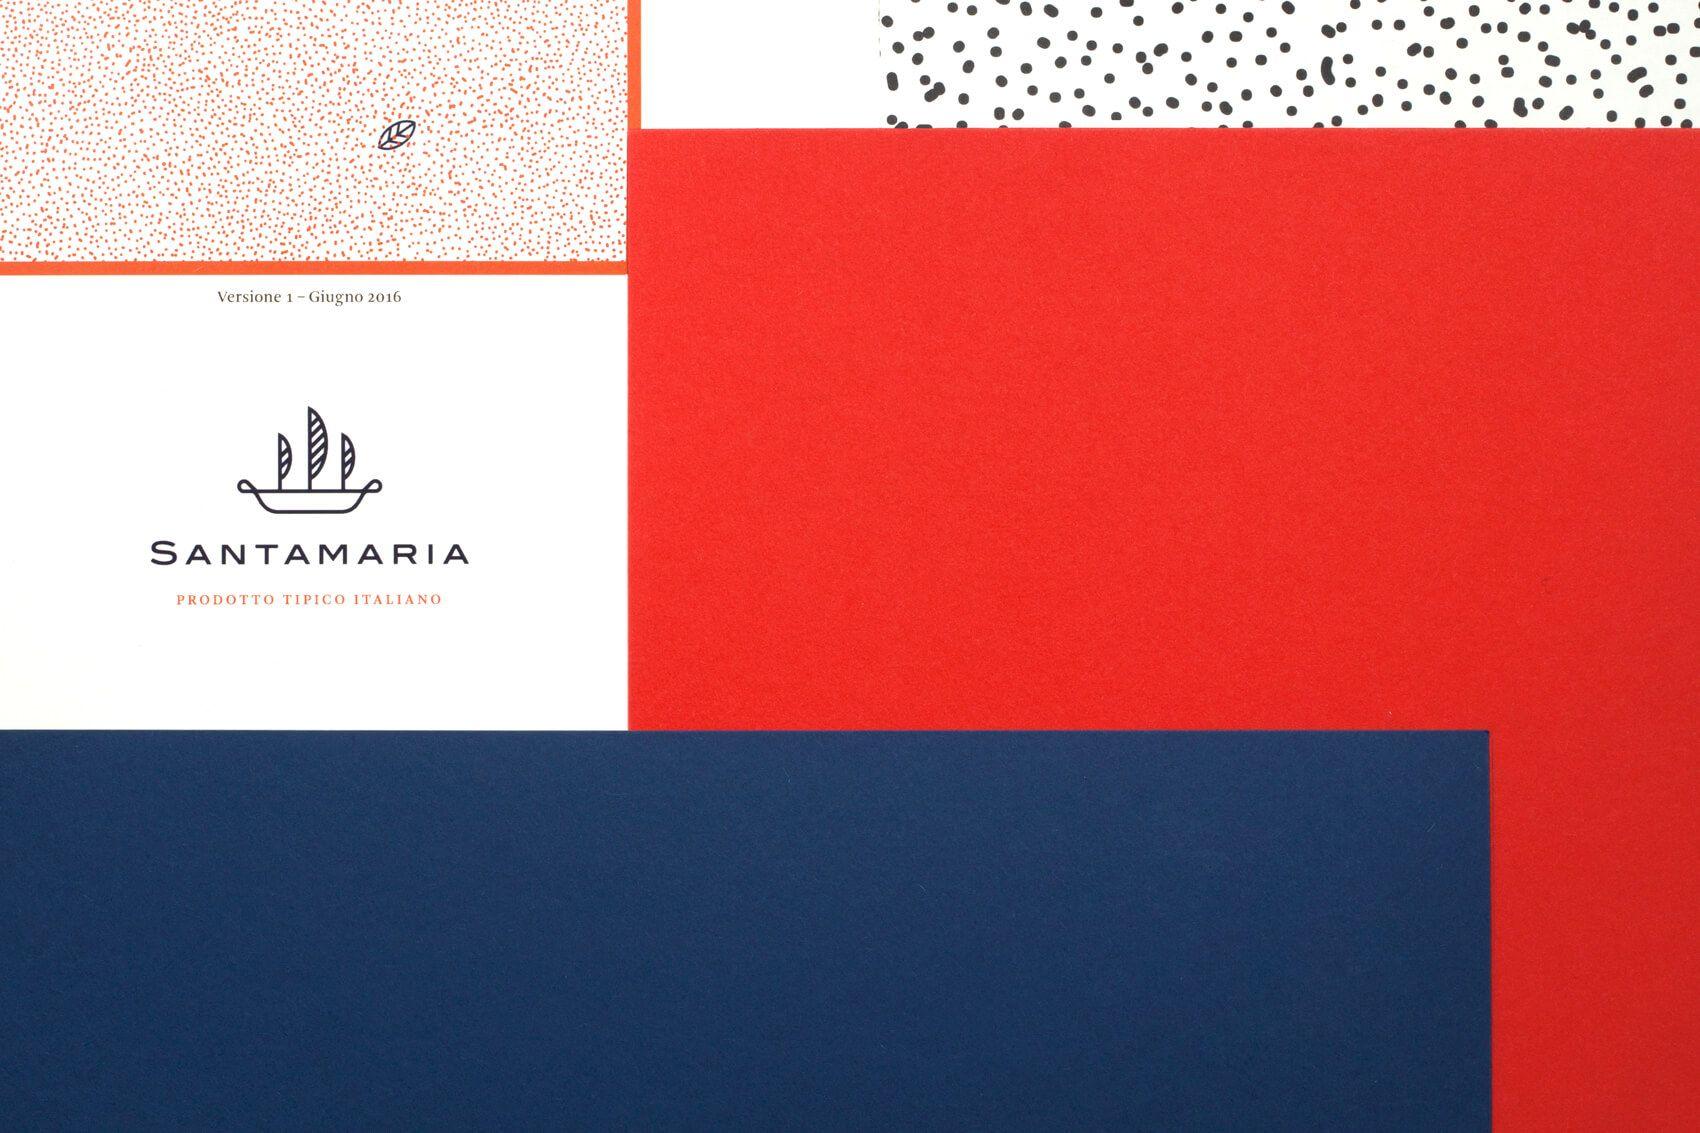 Andrea Dell Anna Santamaria Product branding